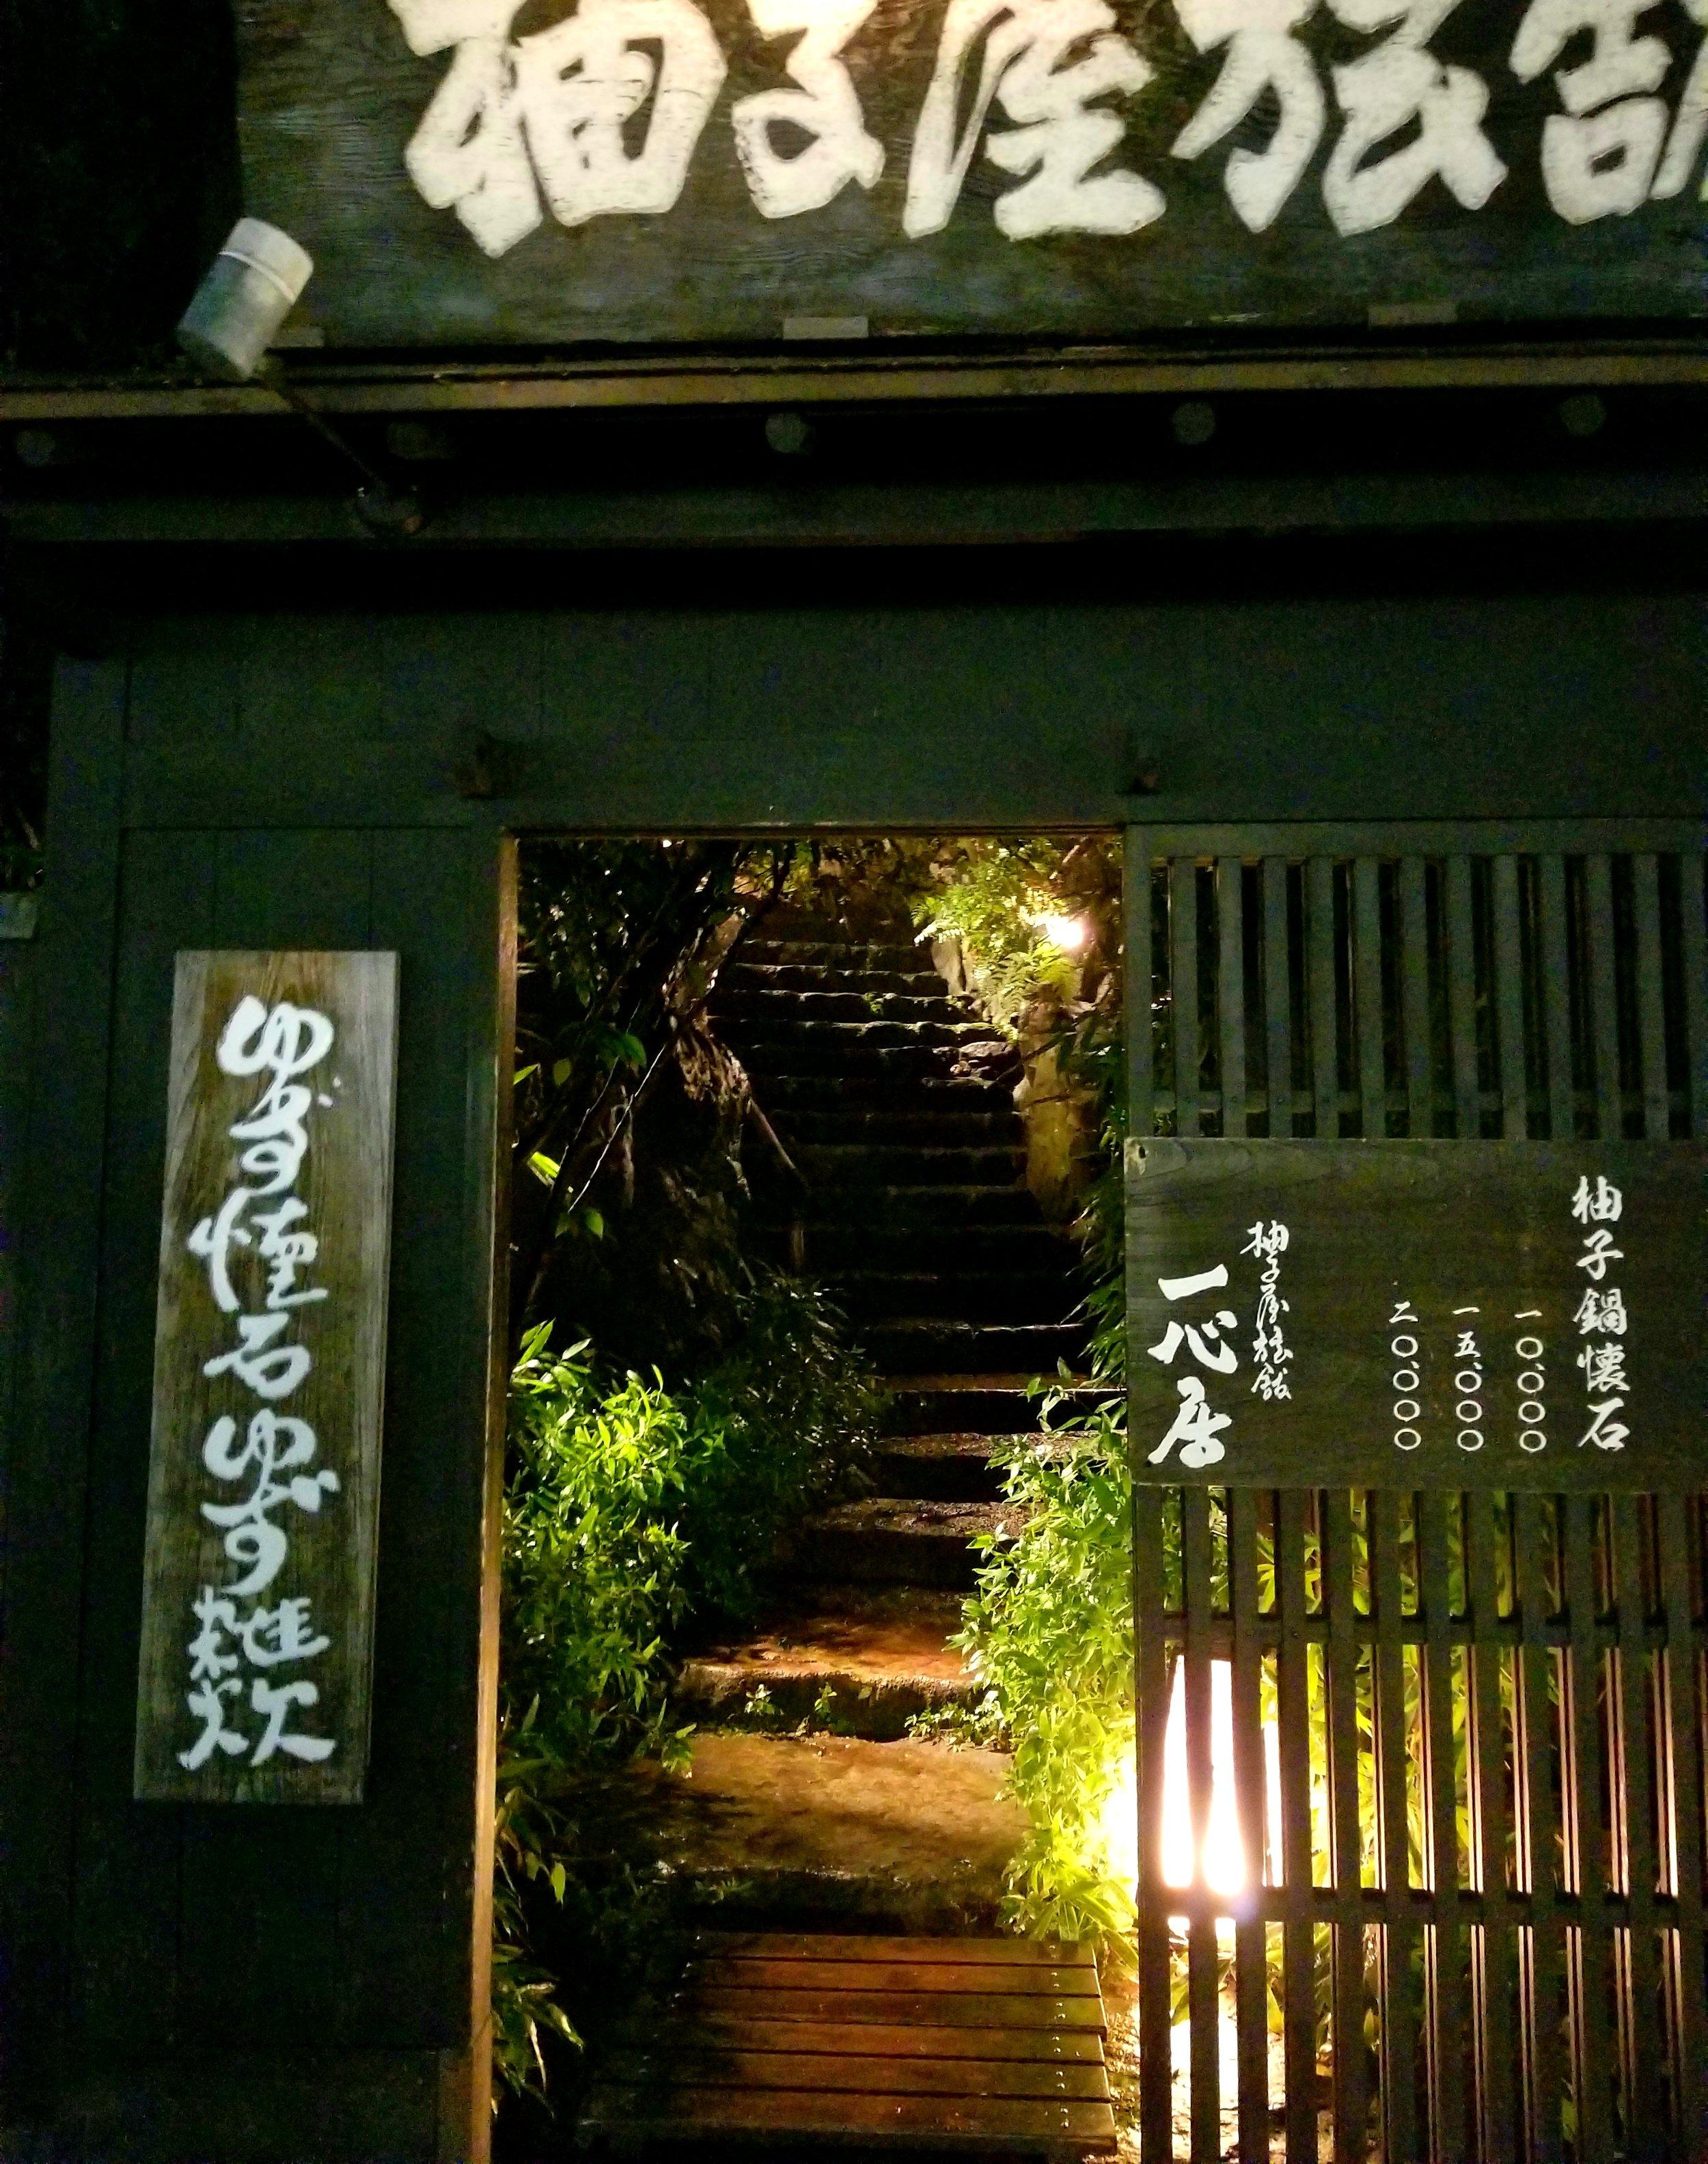 uprooted-traveler-vegan-guide-kyoto-shrine-stairway